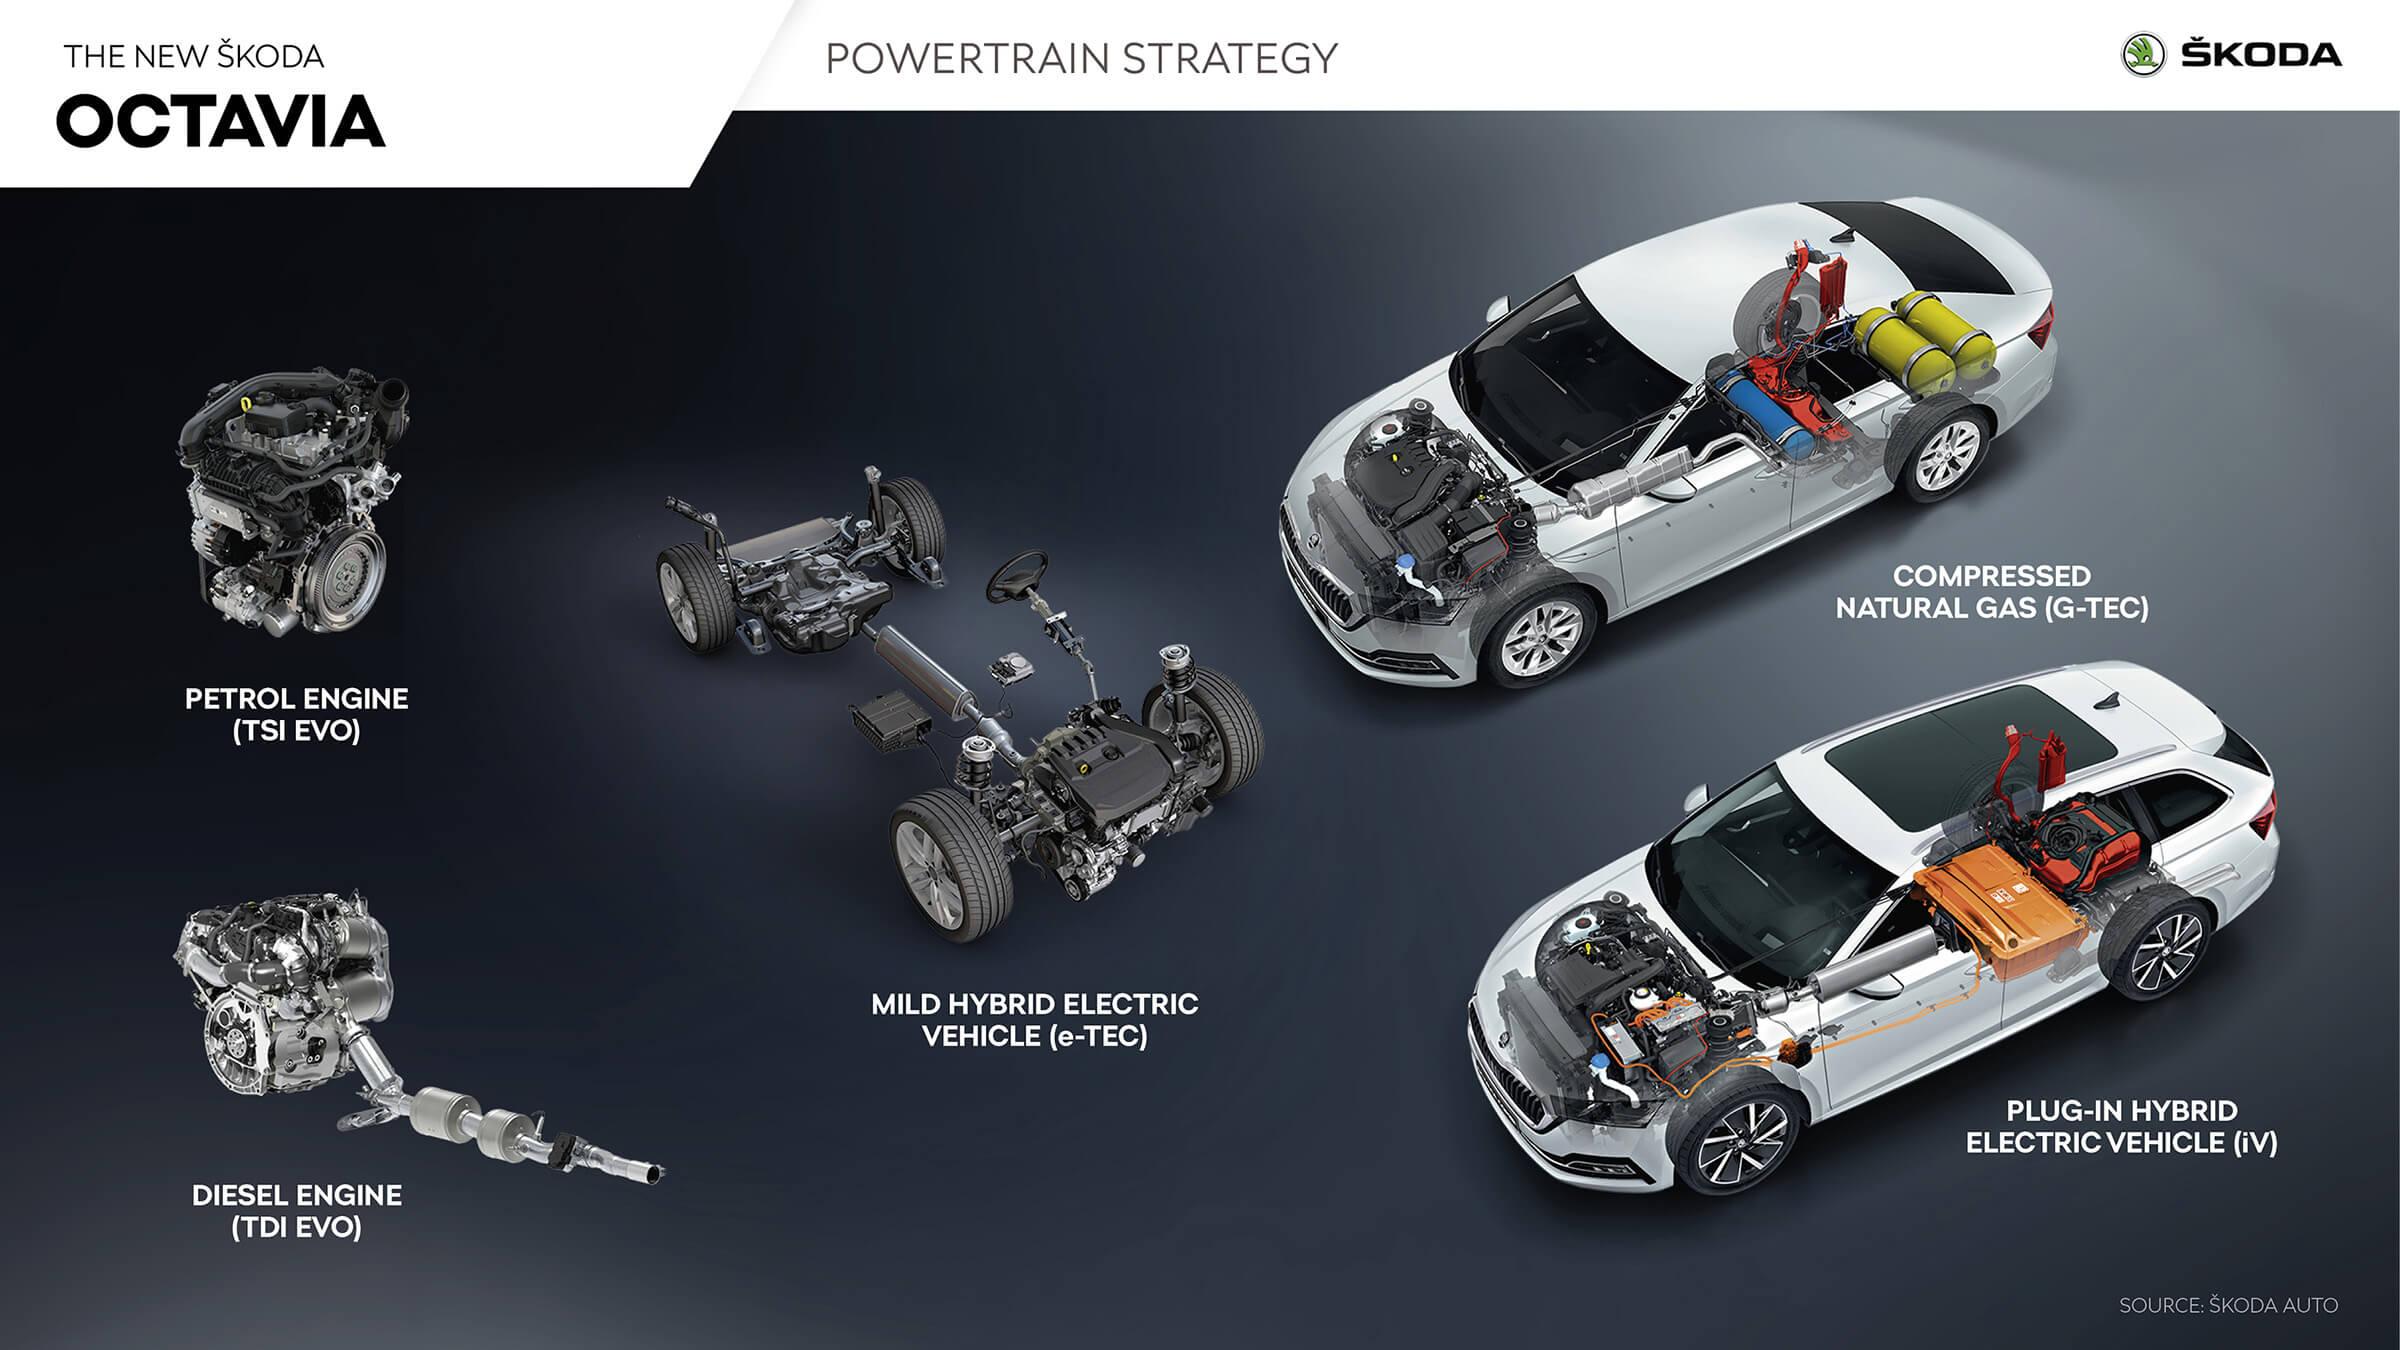 Skoda Octavia powertrain strategy